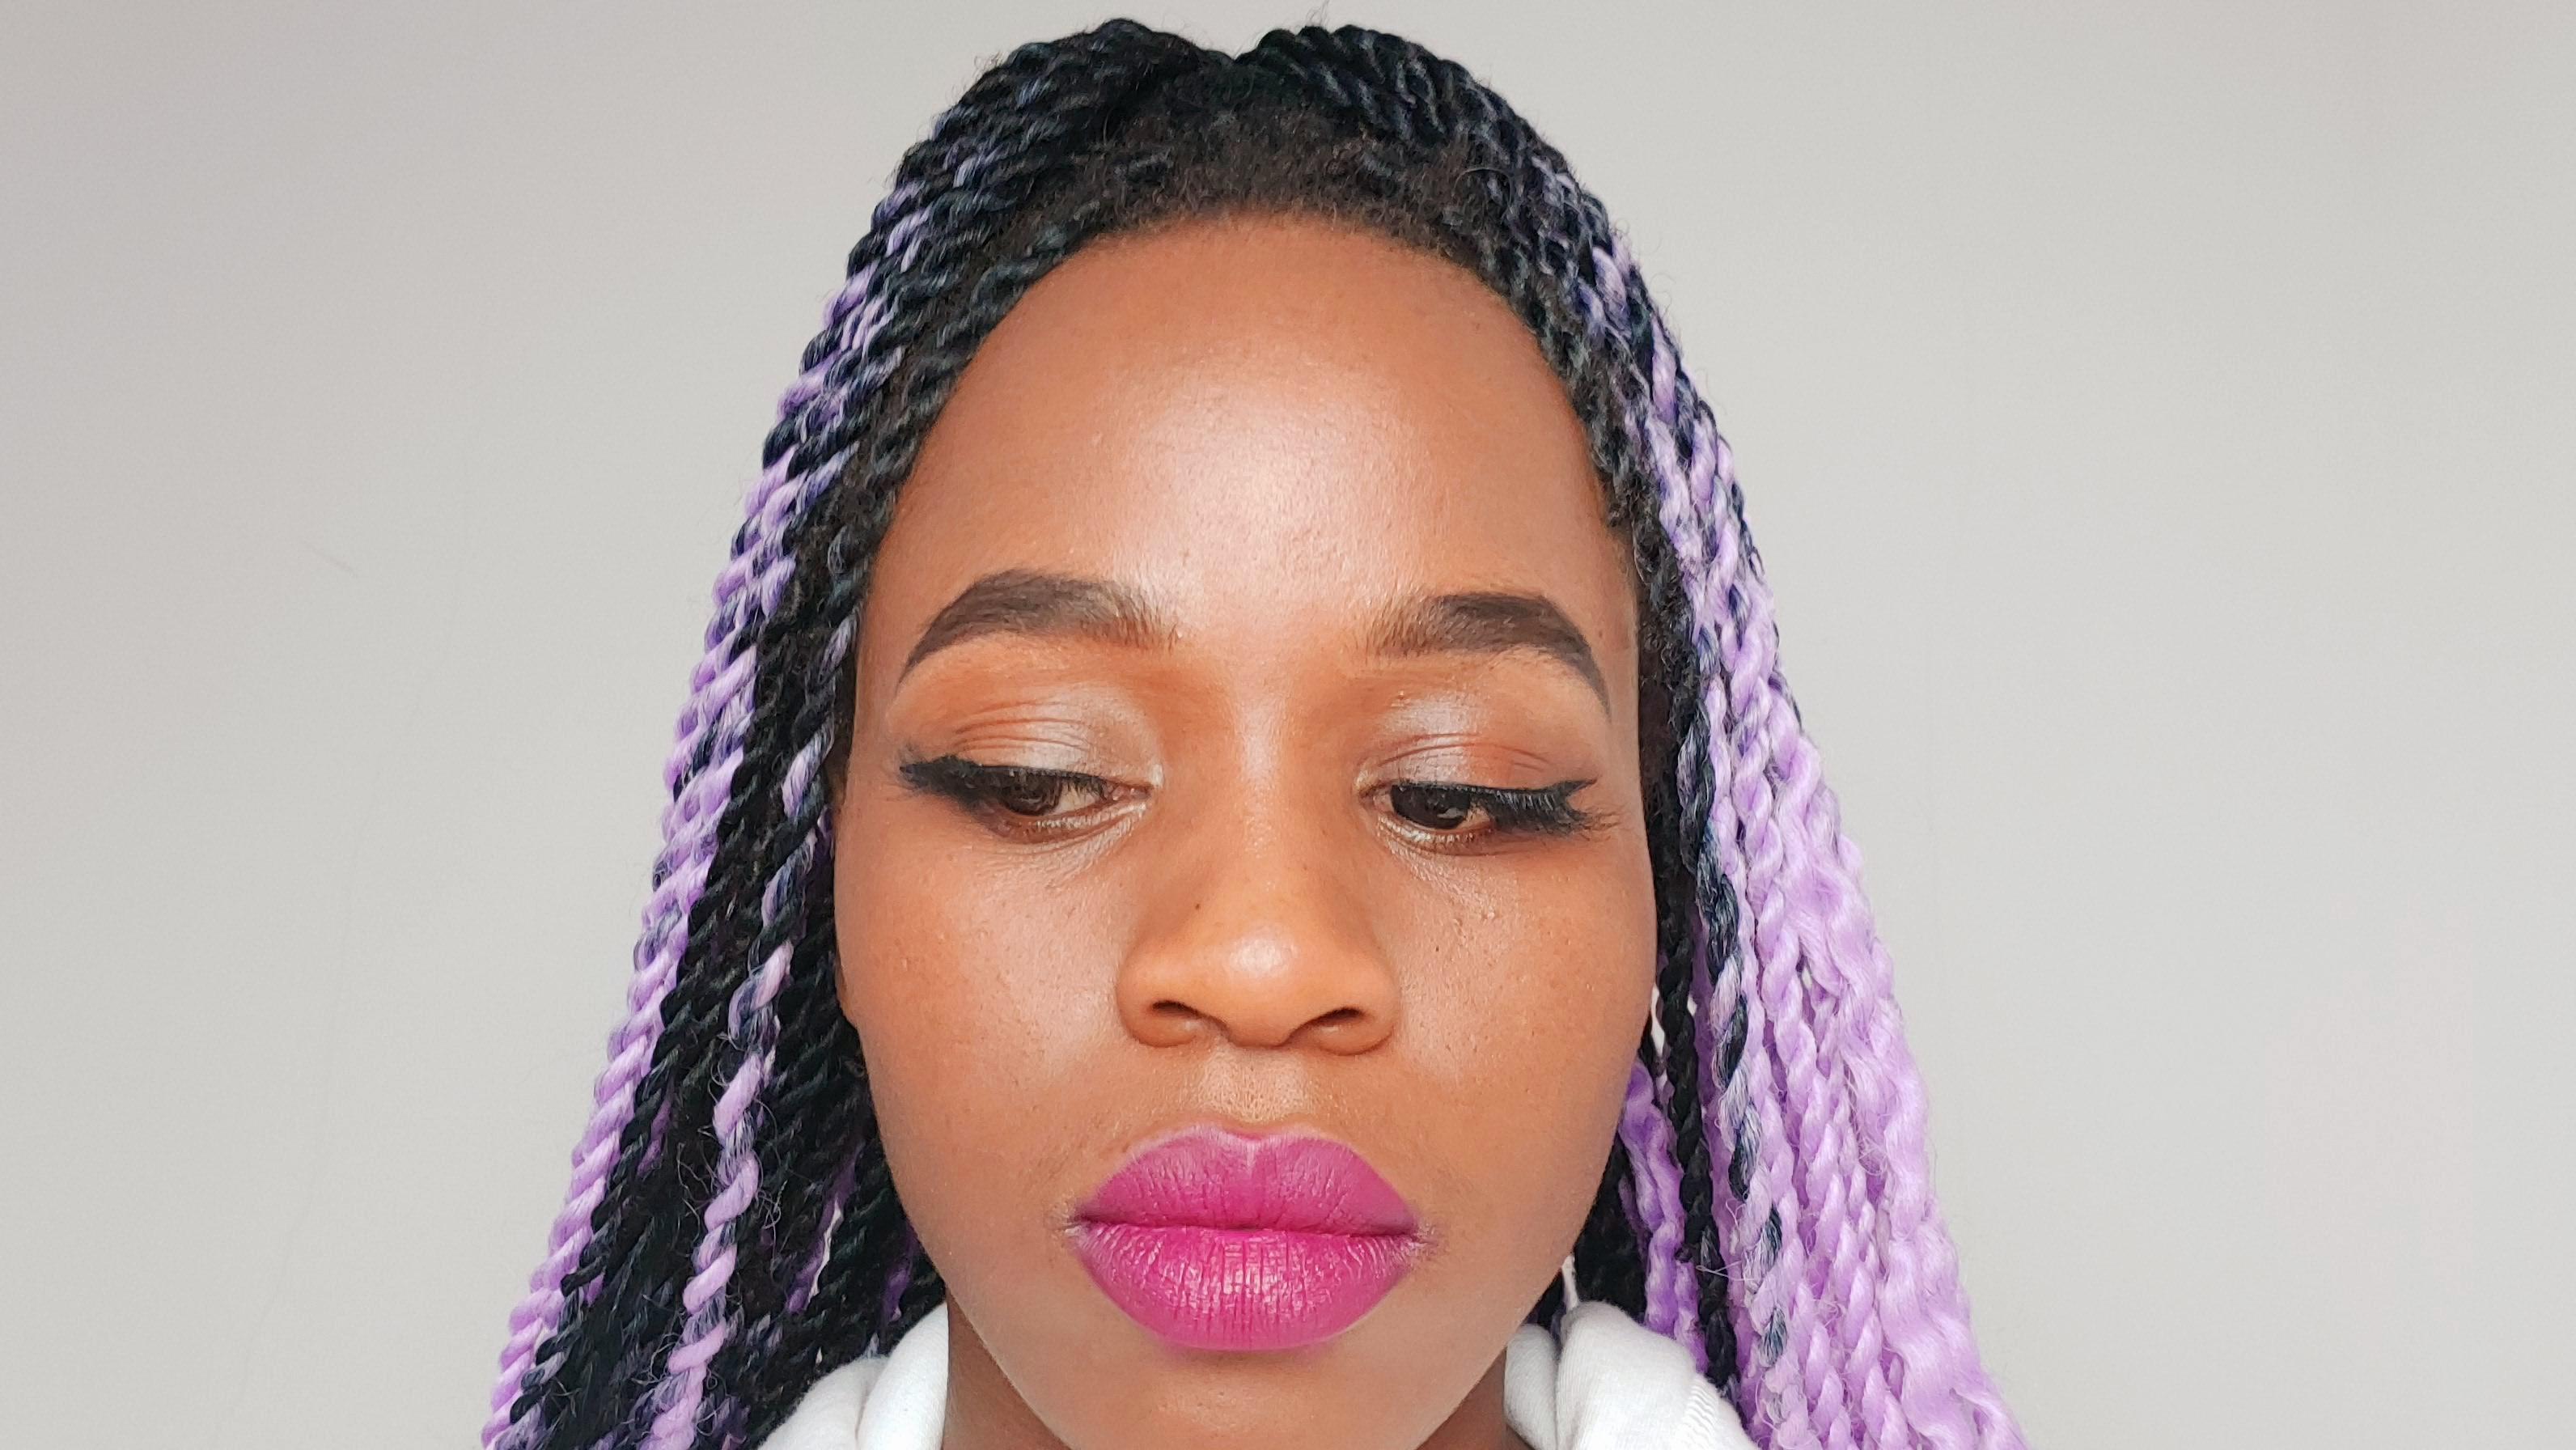 Wholesale mink eyelashes private label vendor with good price-Gorgeous Eyelashes Ltd